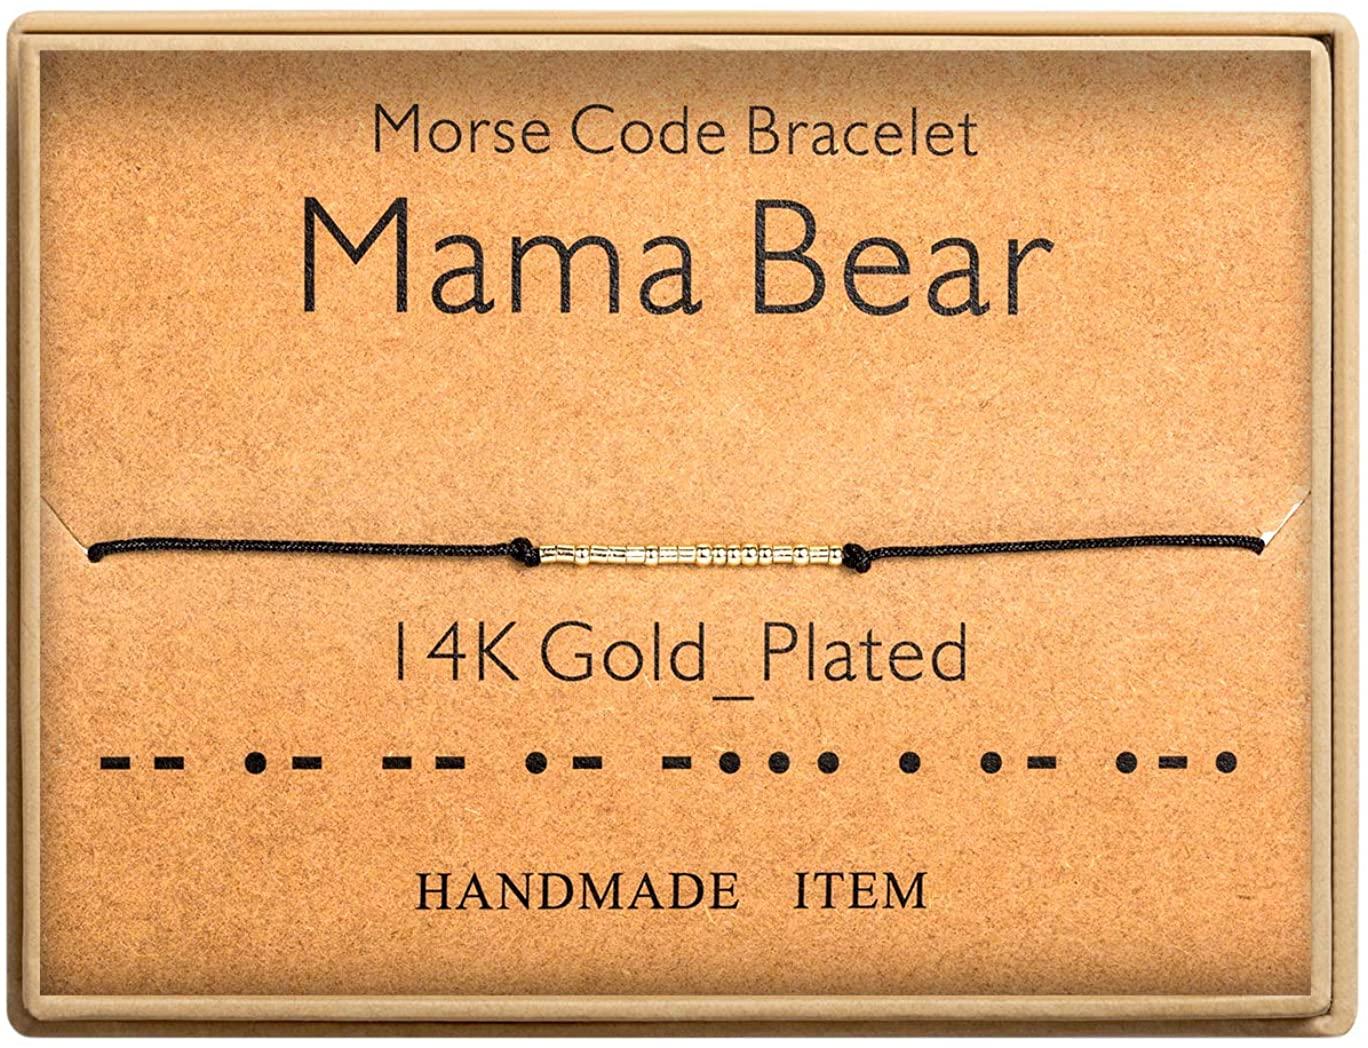 SANNYRA Morse Code Bracelet 14k Gold Plated Beads on Silk Cord Secret Message Aunt Bracelet Gift Jewelry for Her